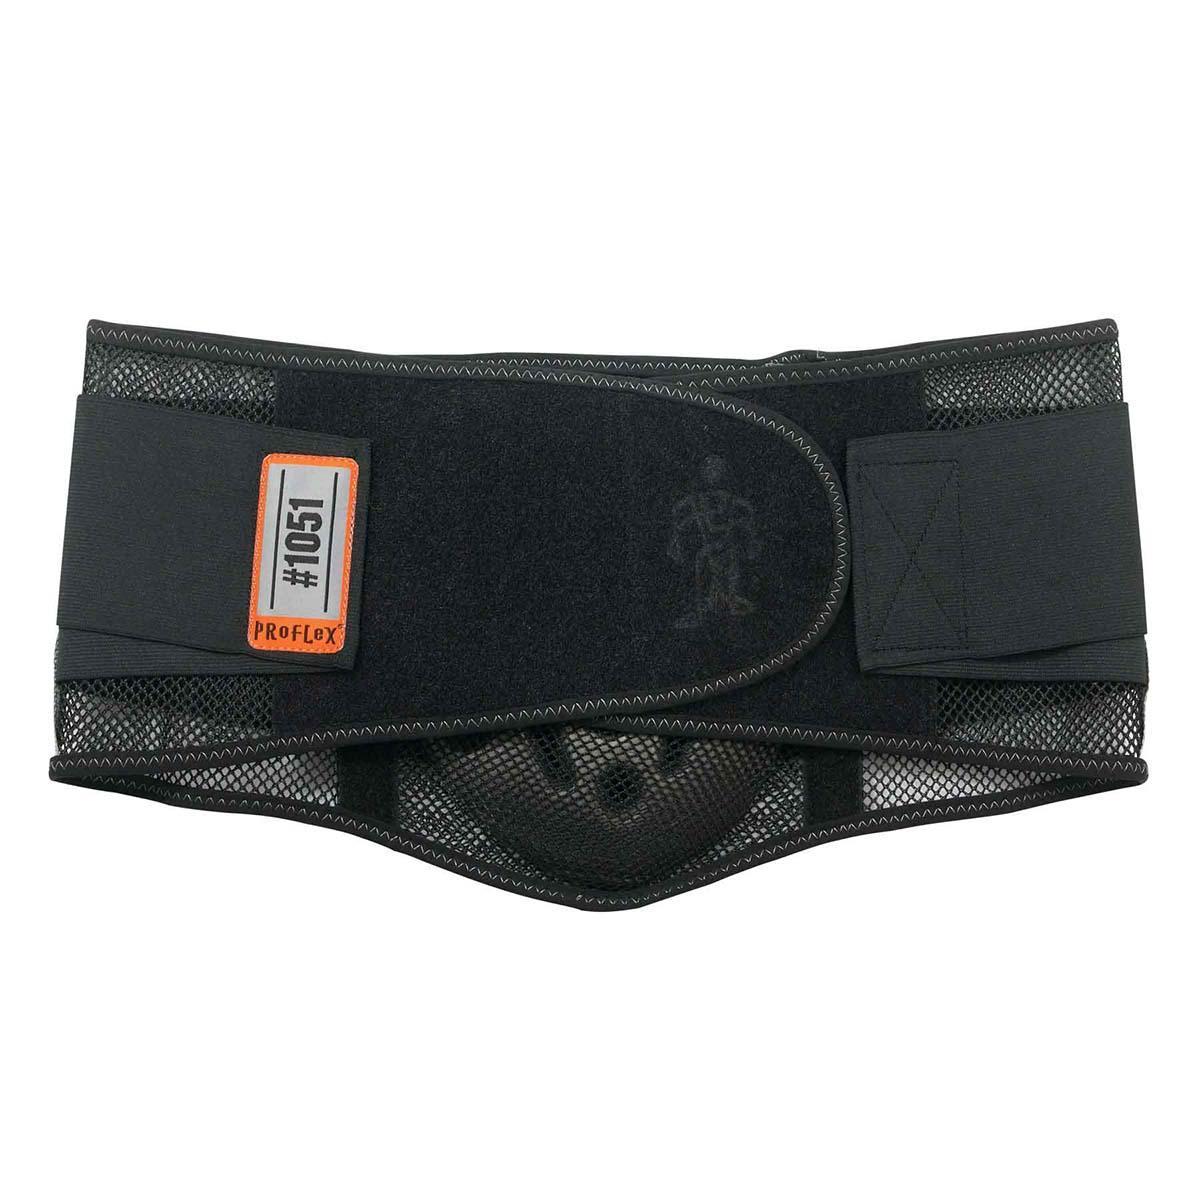 1051 L Black Mesh Back Support w/Lumbar Pad